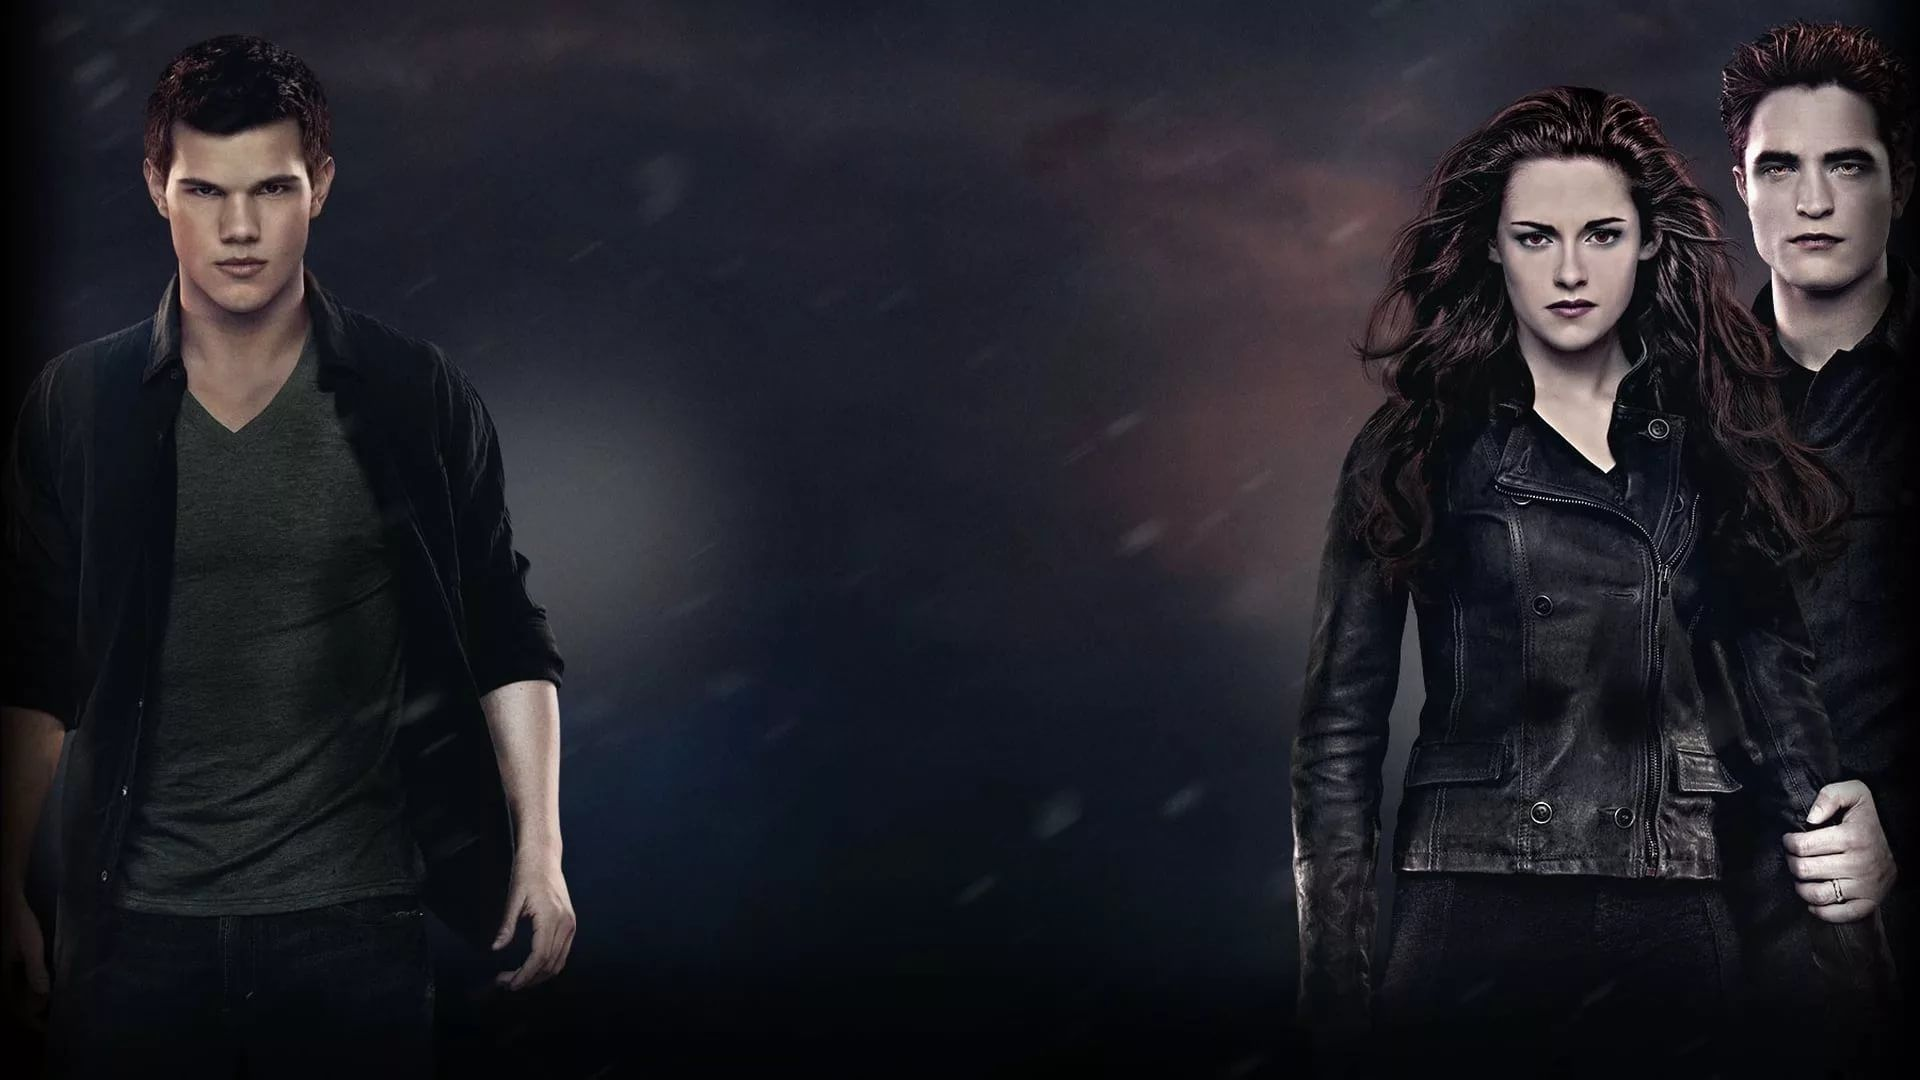 Twilight Saga wallpaper photo hd